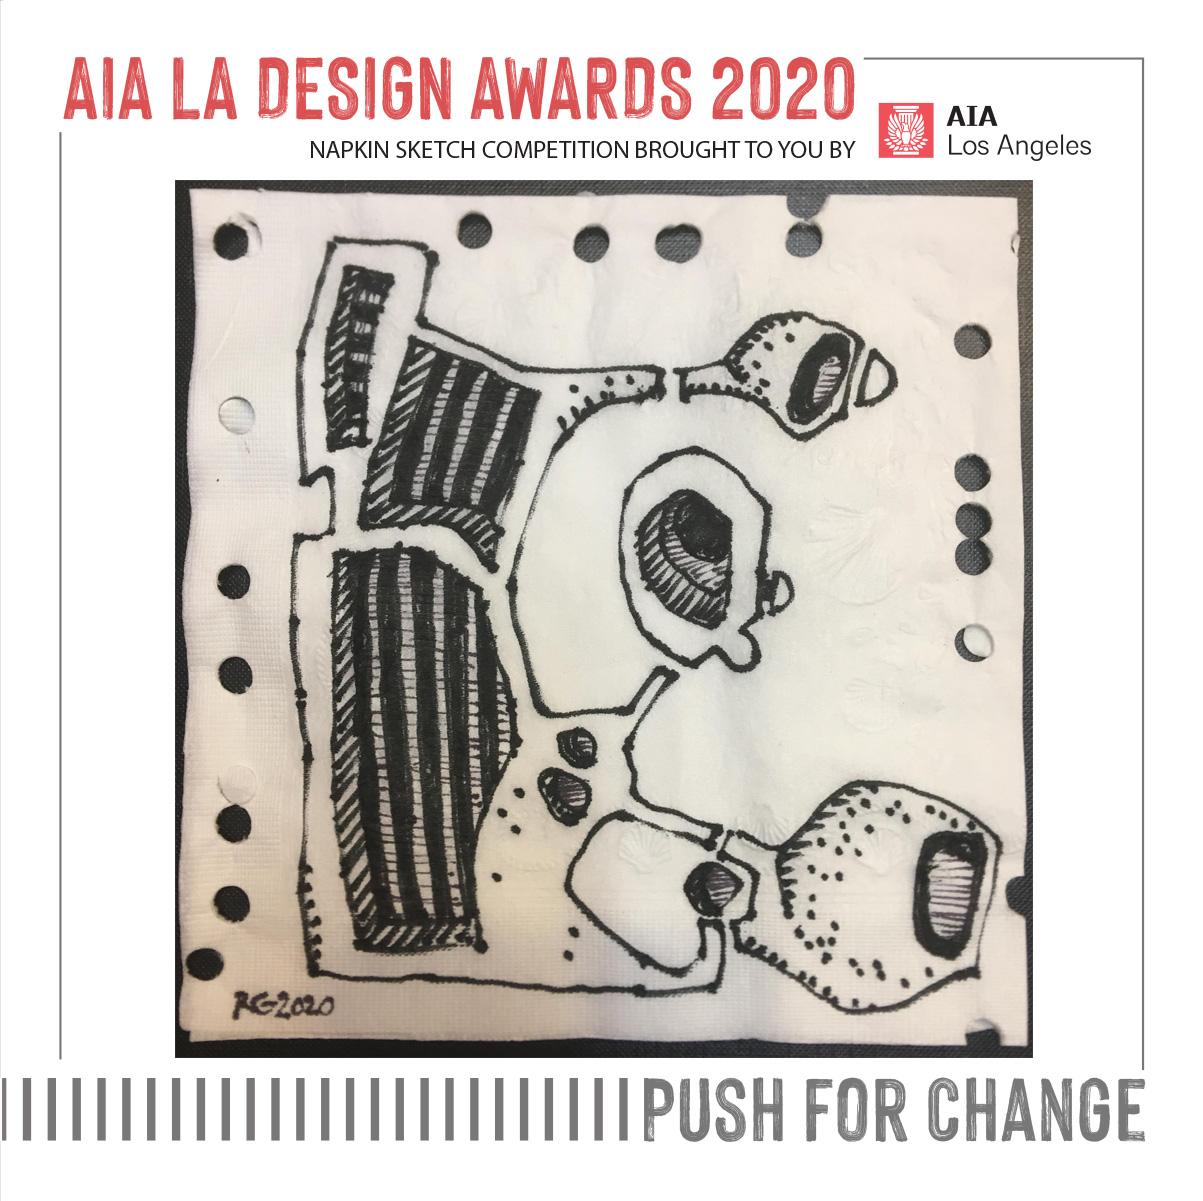 Napkin Sketch for AIA|LA Design Awards